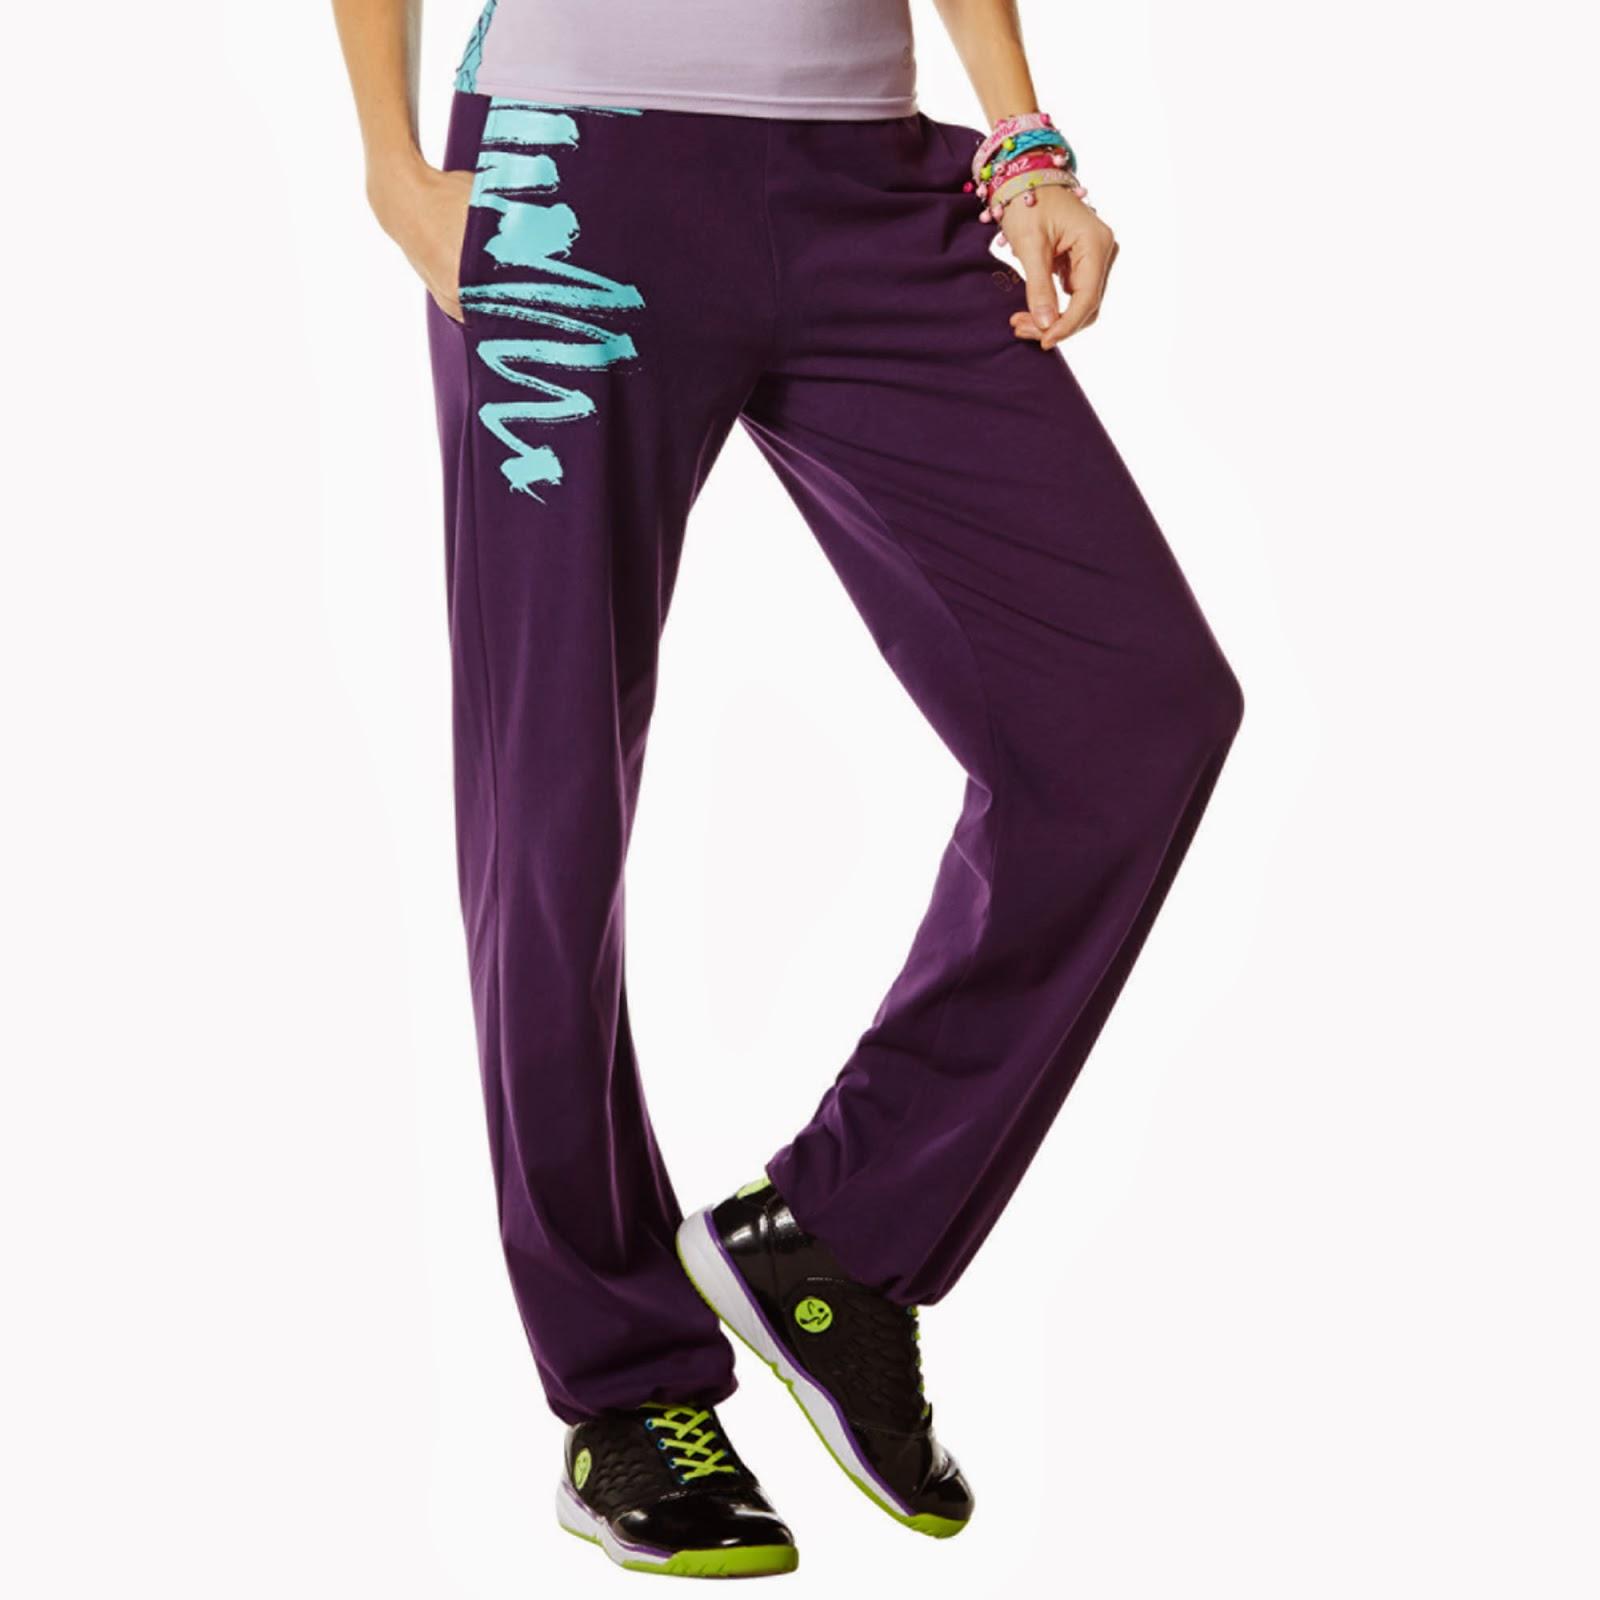 http://www.zumba.com/en-US/store-zin/US/product/gotta-jam-jersey-pant?color=Berry+Nice